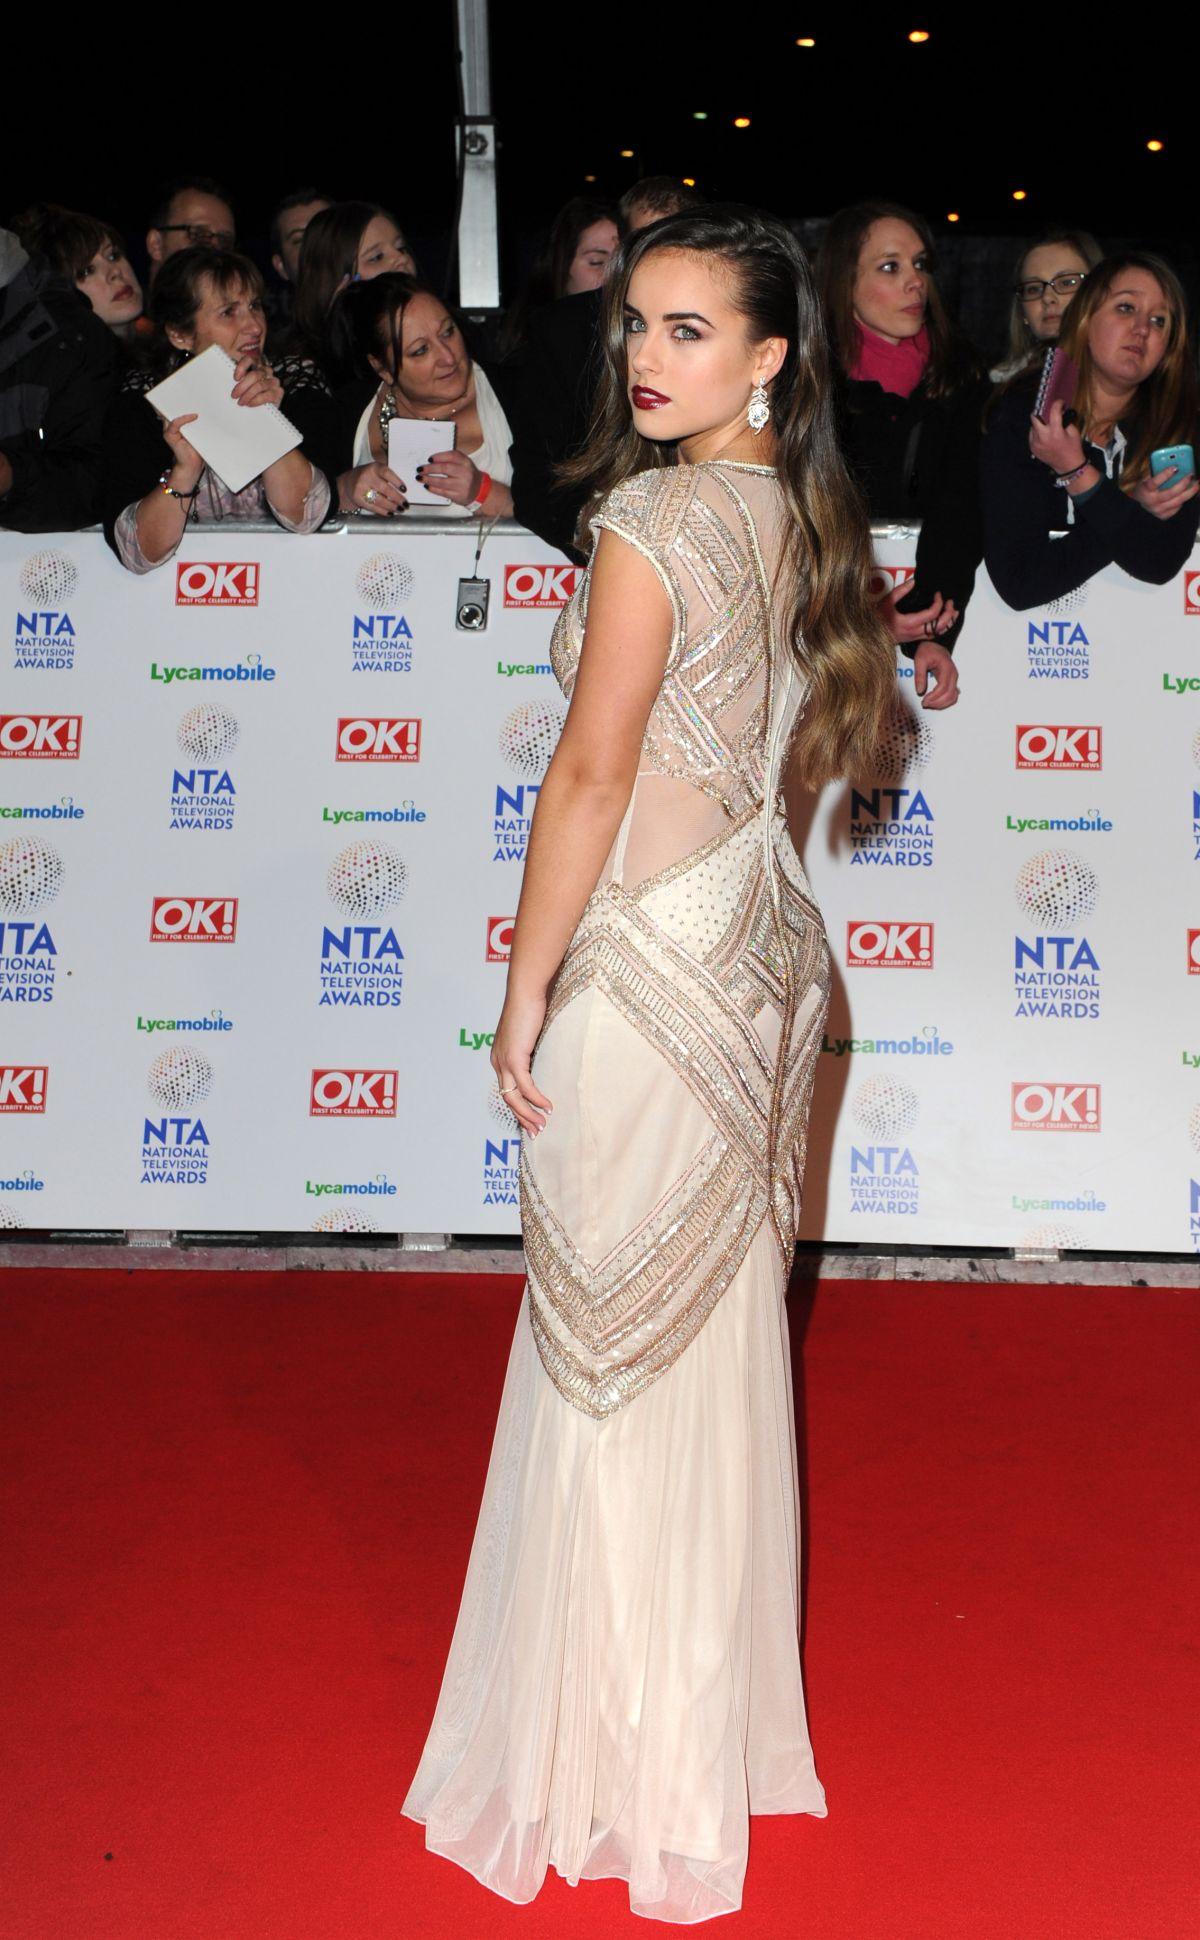 National Television Awards